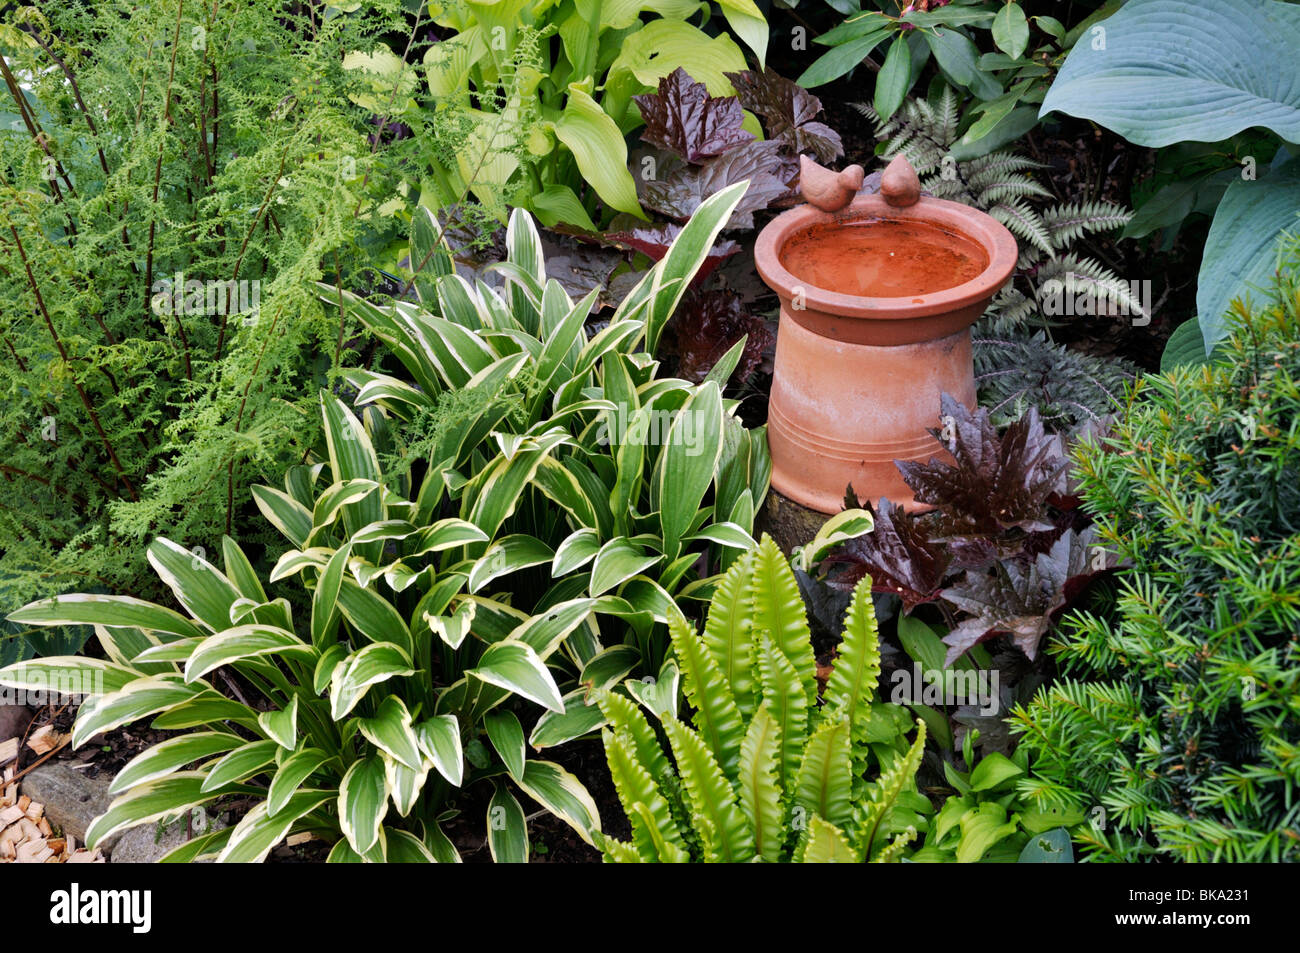 Plantain lilies Hosta harts tongue fern Asplenium